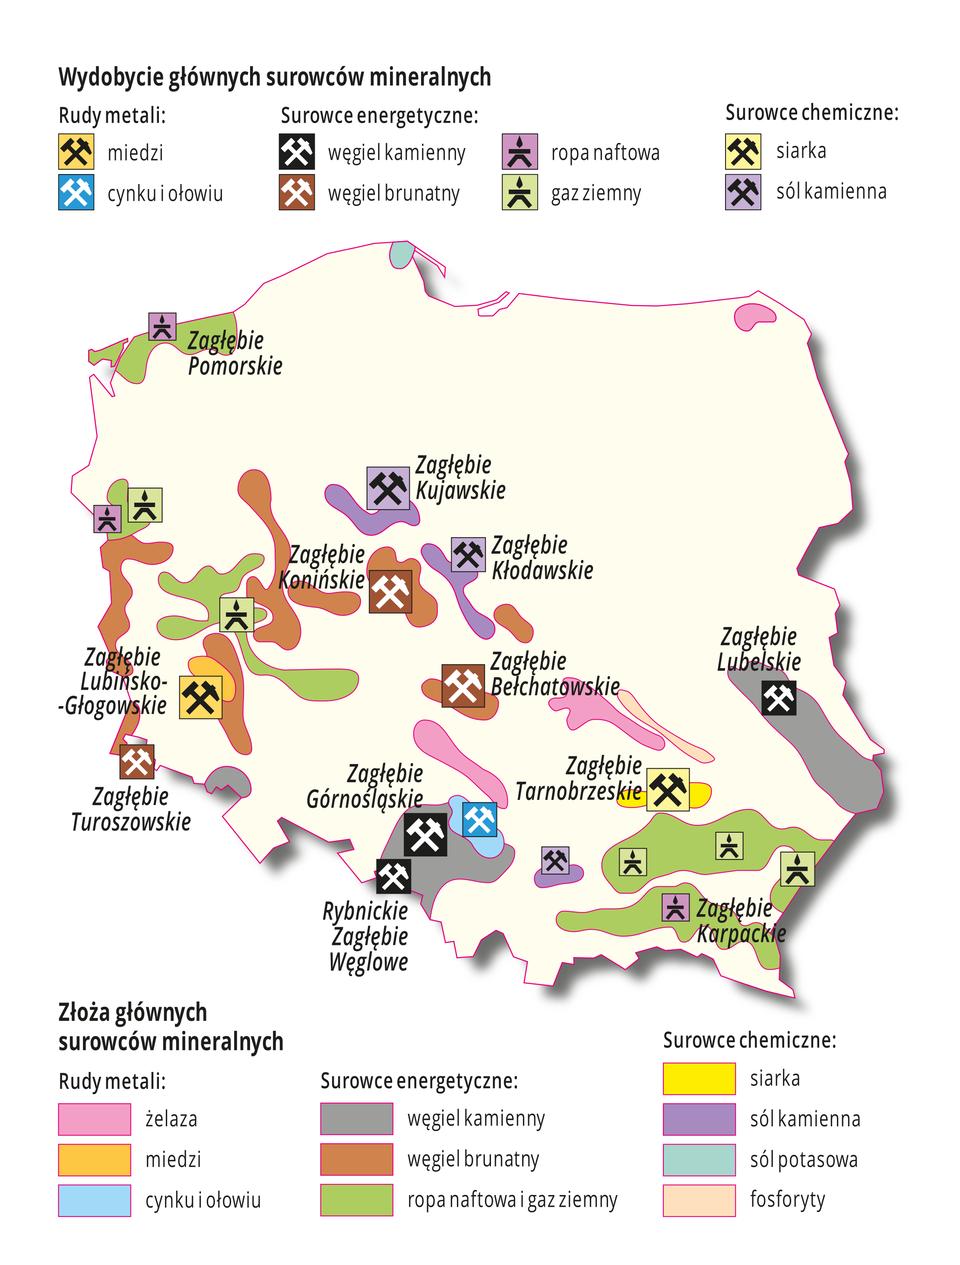 Bogactwa mineralne Polski